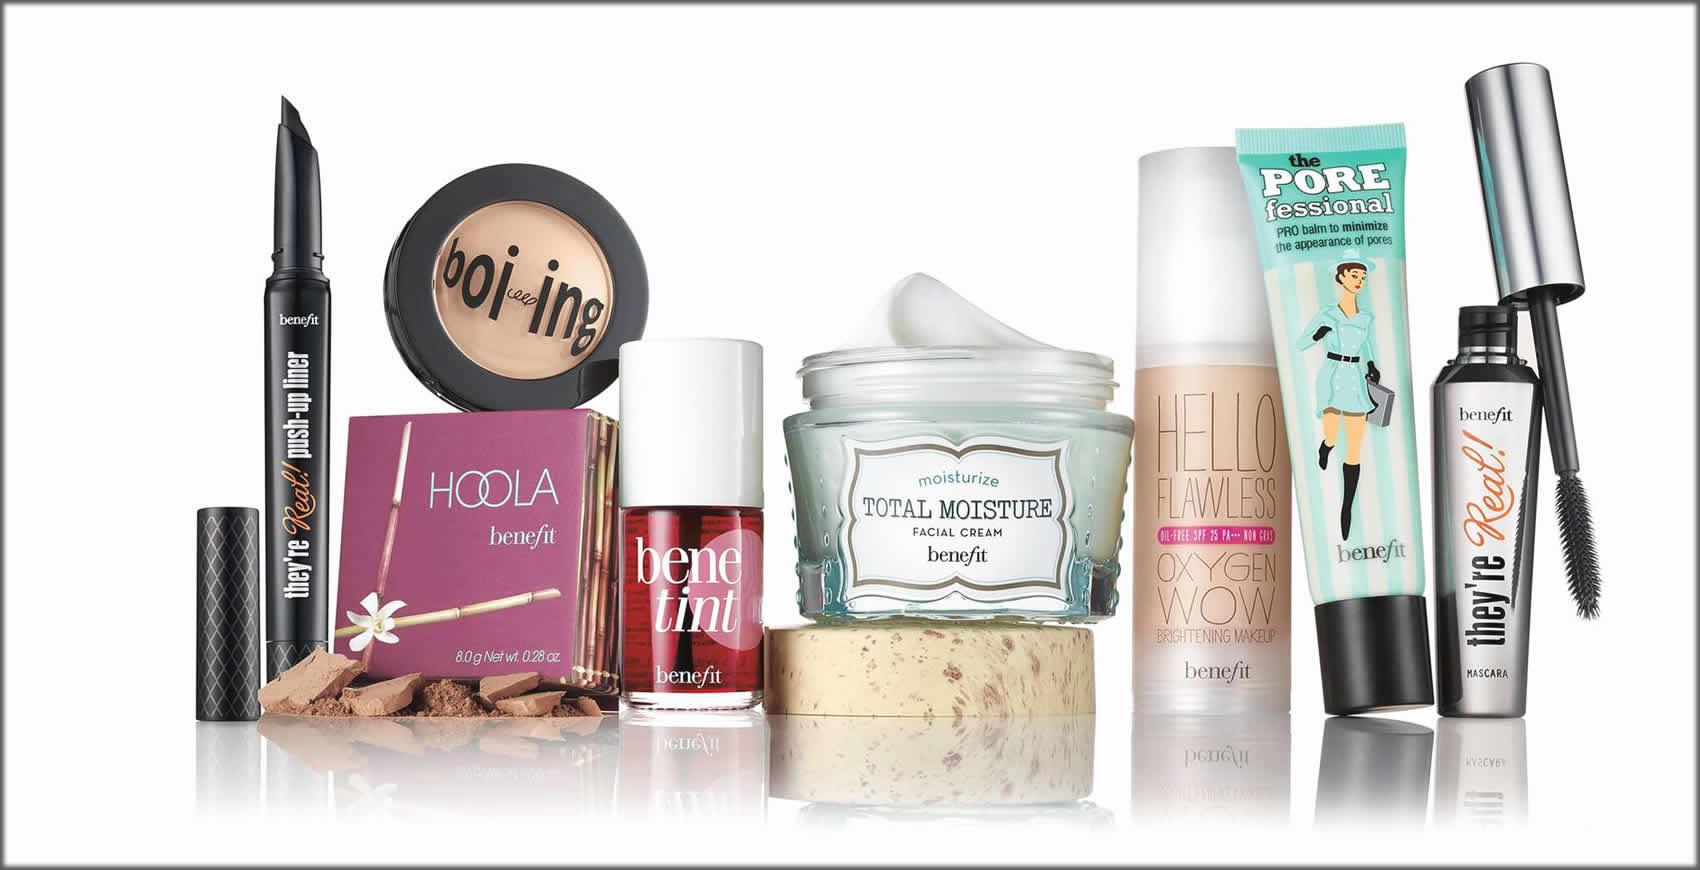 Benefit Cosmetics And Makeup Brand